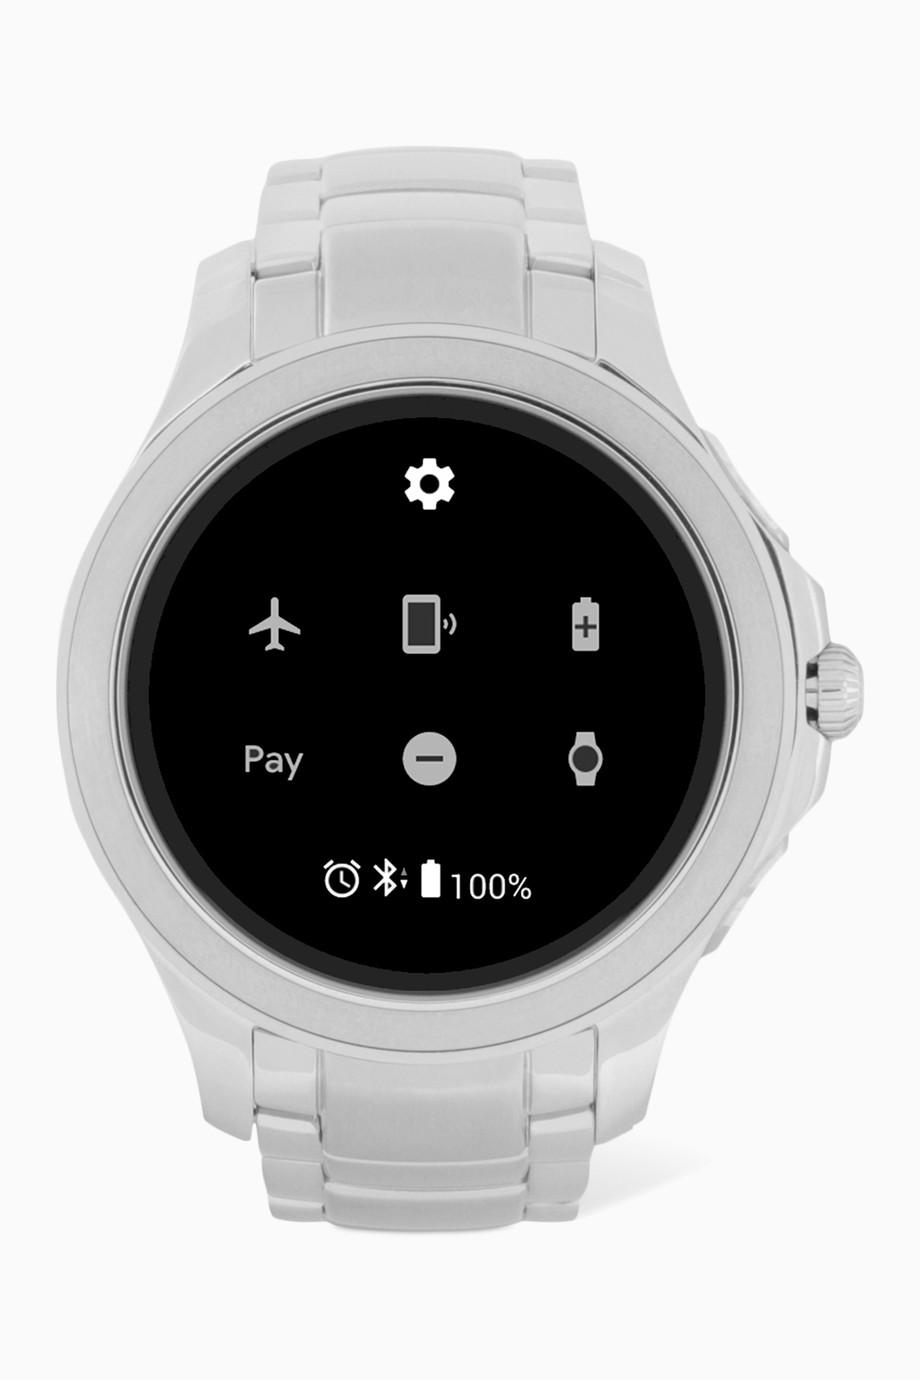 dfc77abbb تسوق ساعة ألبرتو ذكية ستانلس ستيل Emporio Armani ملون للرجال | اُناس